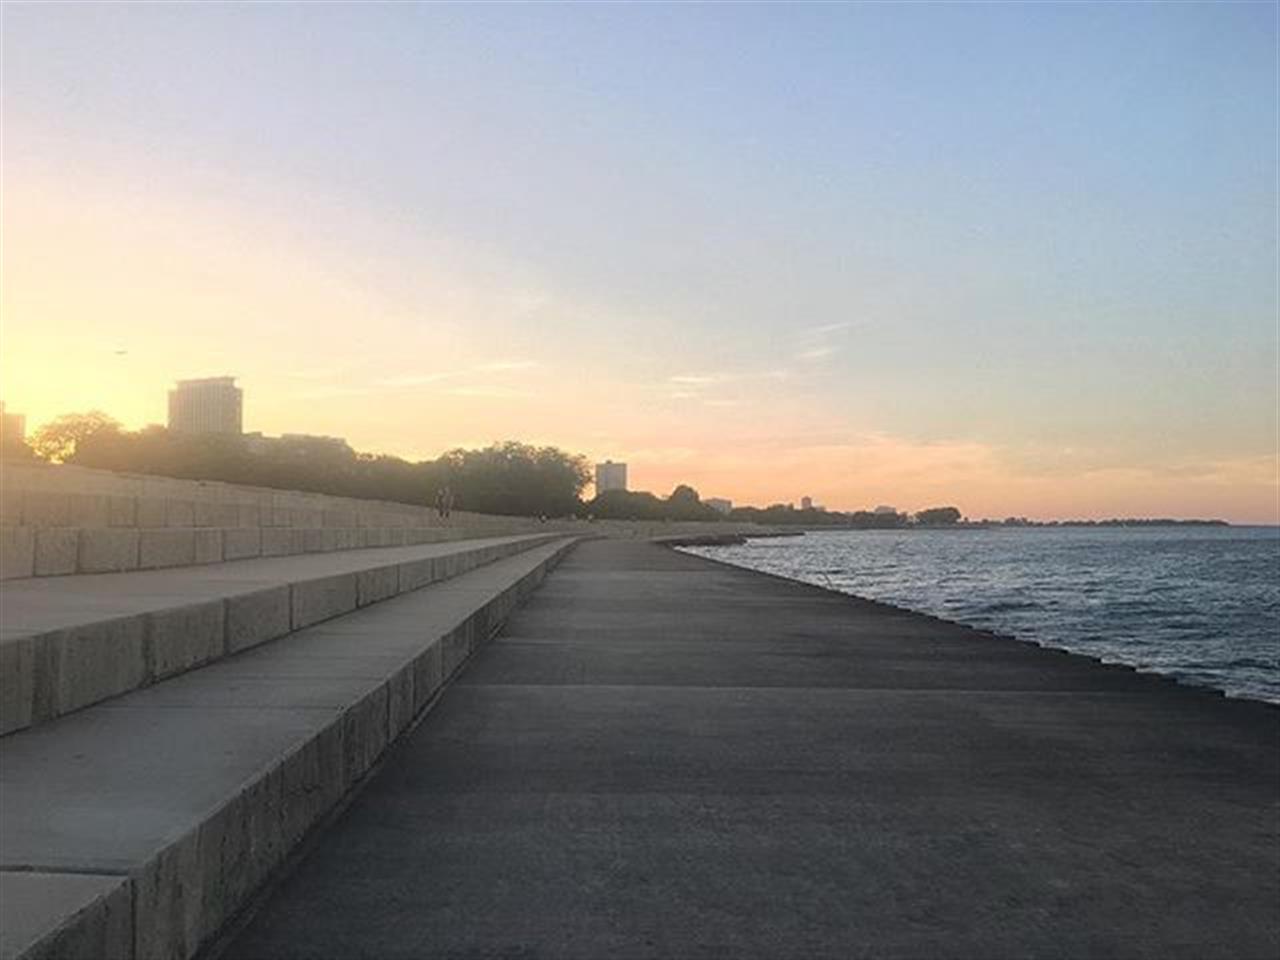 #Chicago #citybythelake #lakemichigan #sunset #lakefronttrail #leadingrelocal #bairdwarner #realestate